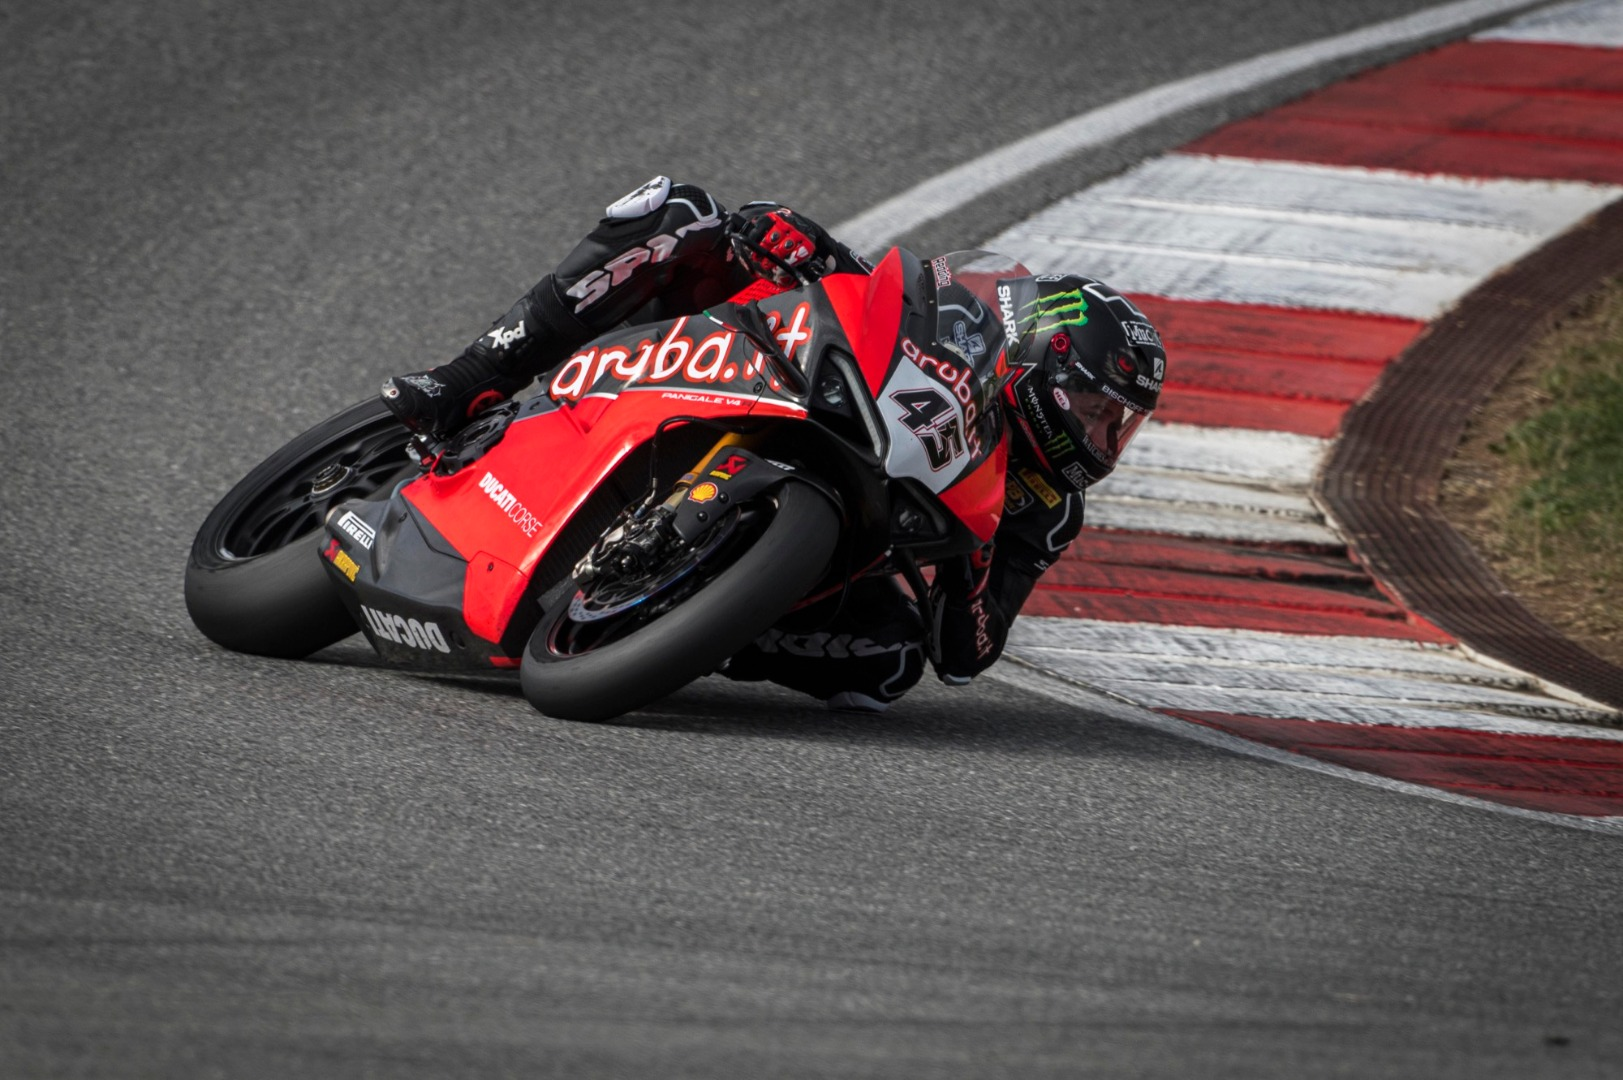 Scott Redding - Aruba Ducati 2020 - Test invernales